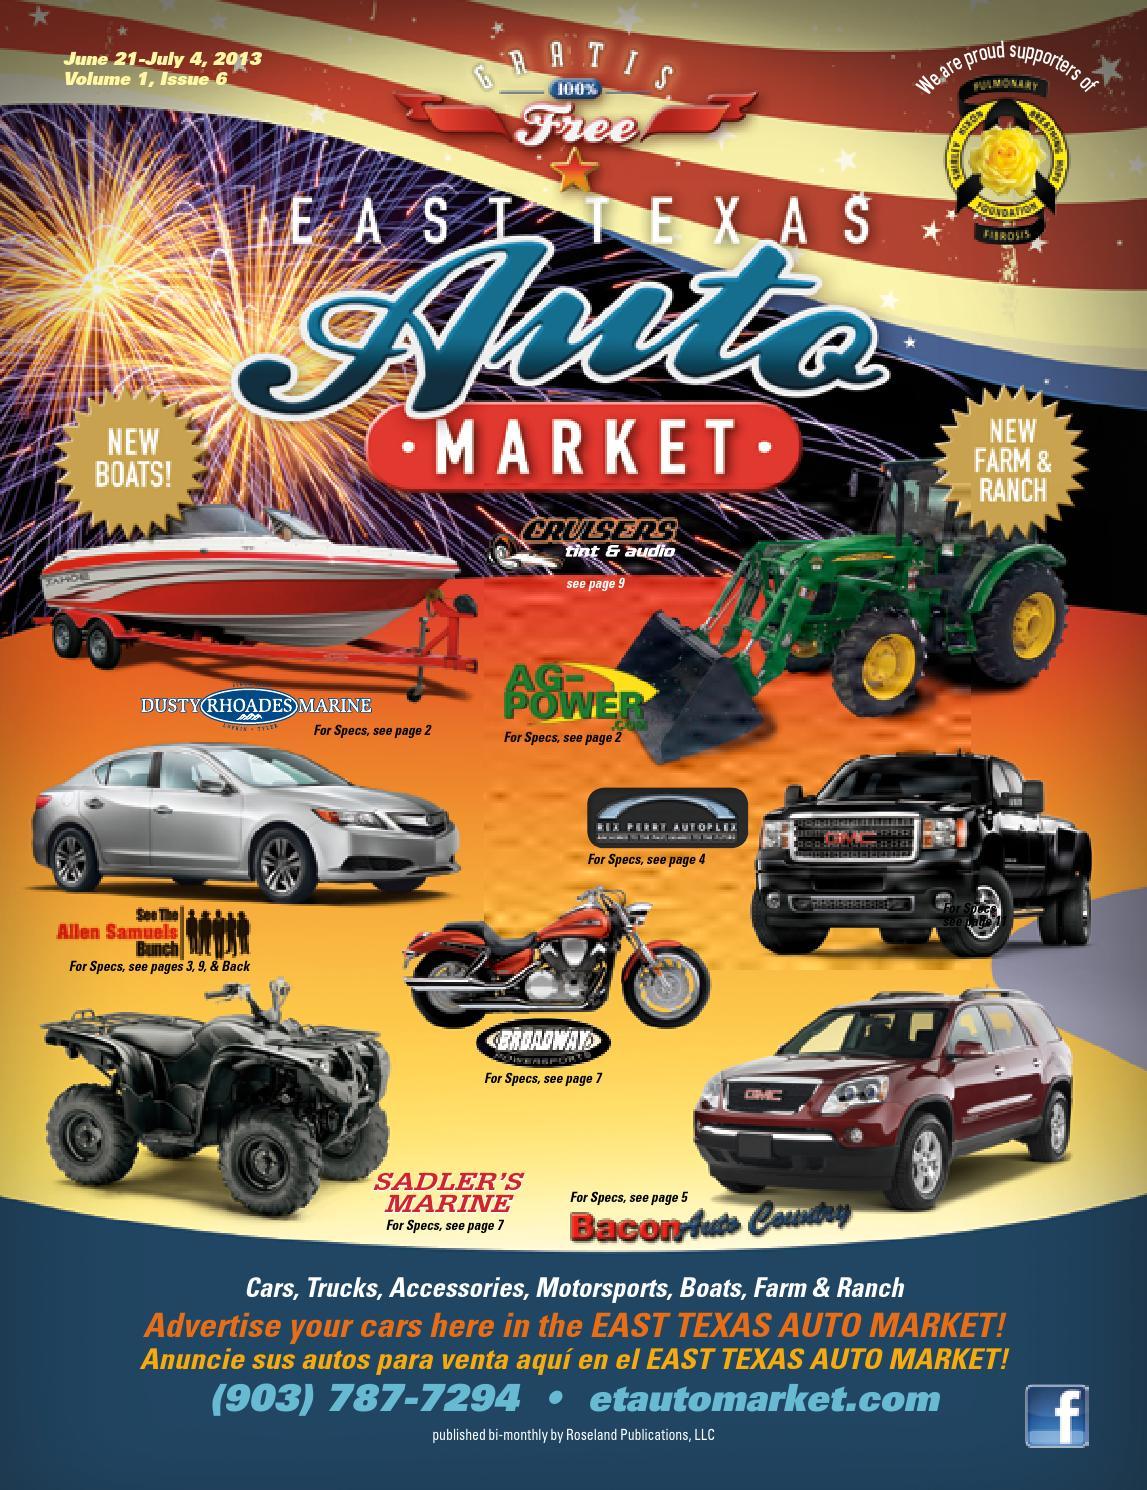 east texas auto market volume 1 issue 6 by ronnie mason issuu issuu